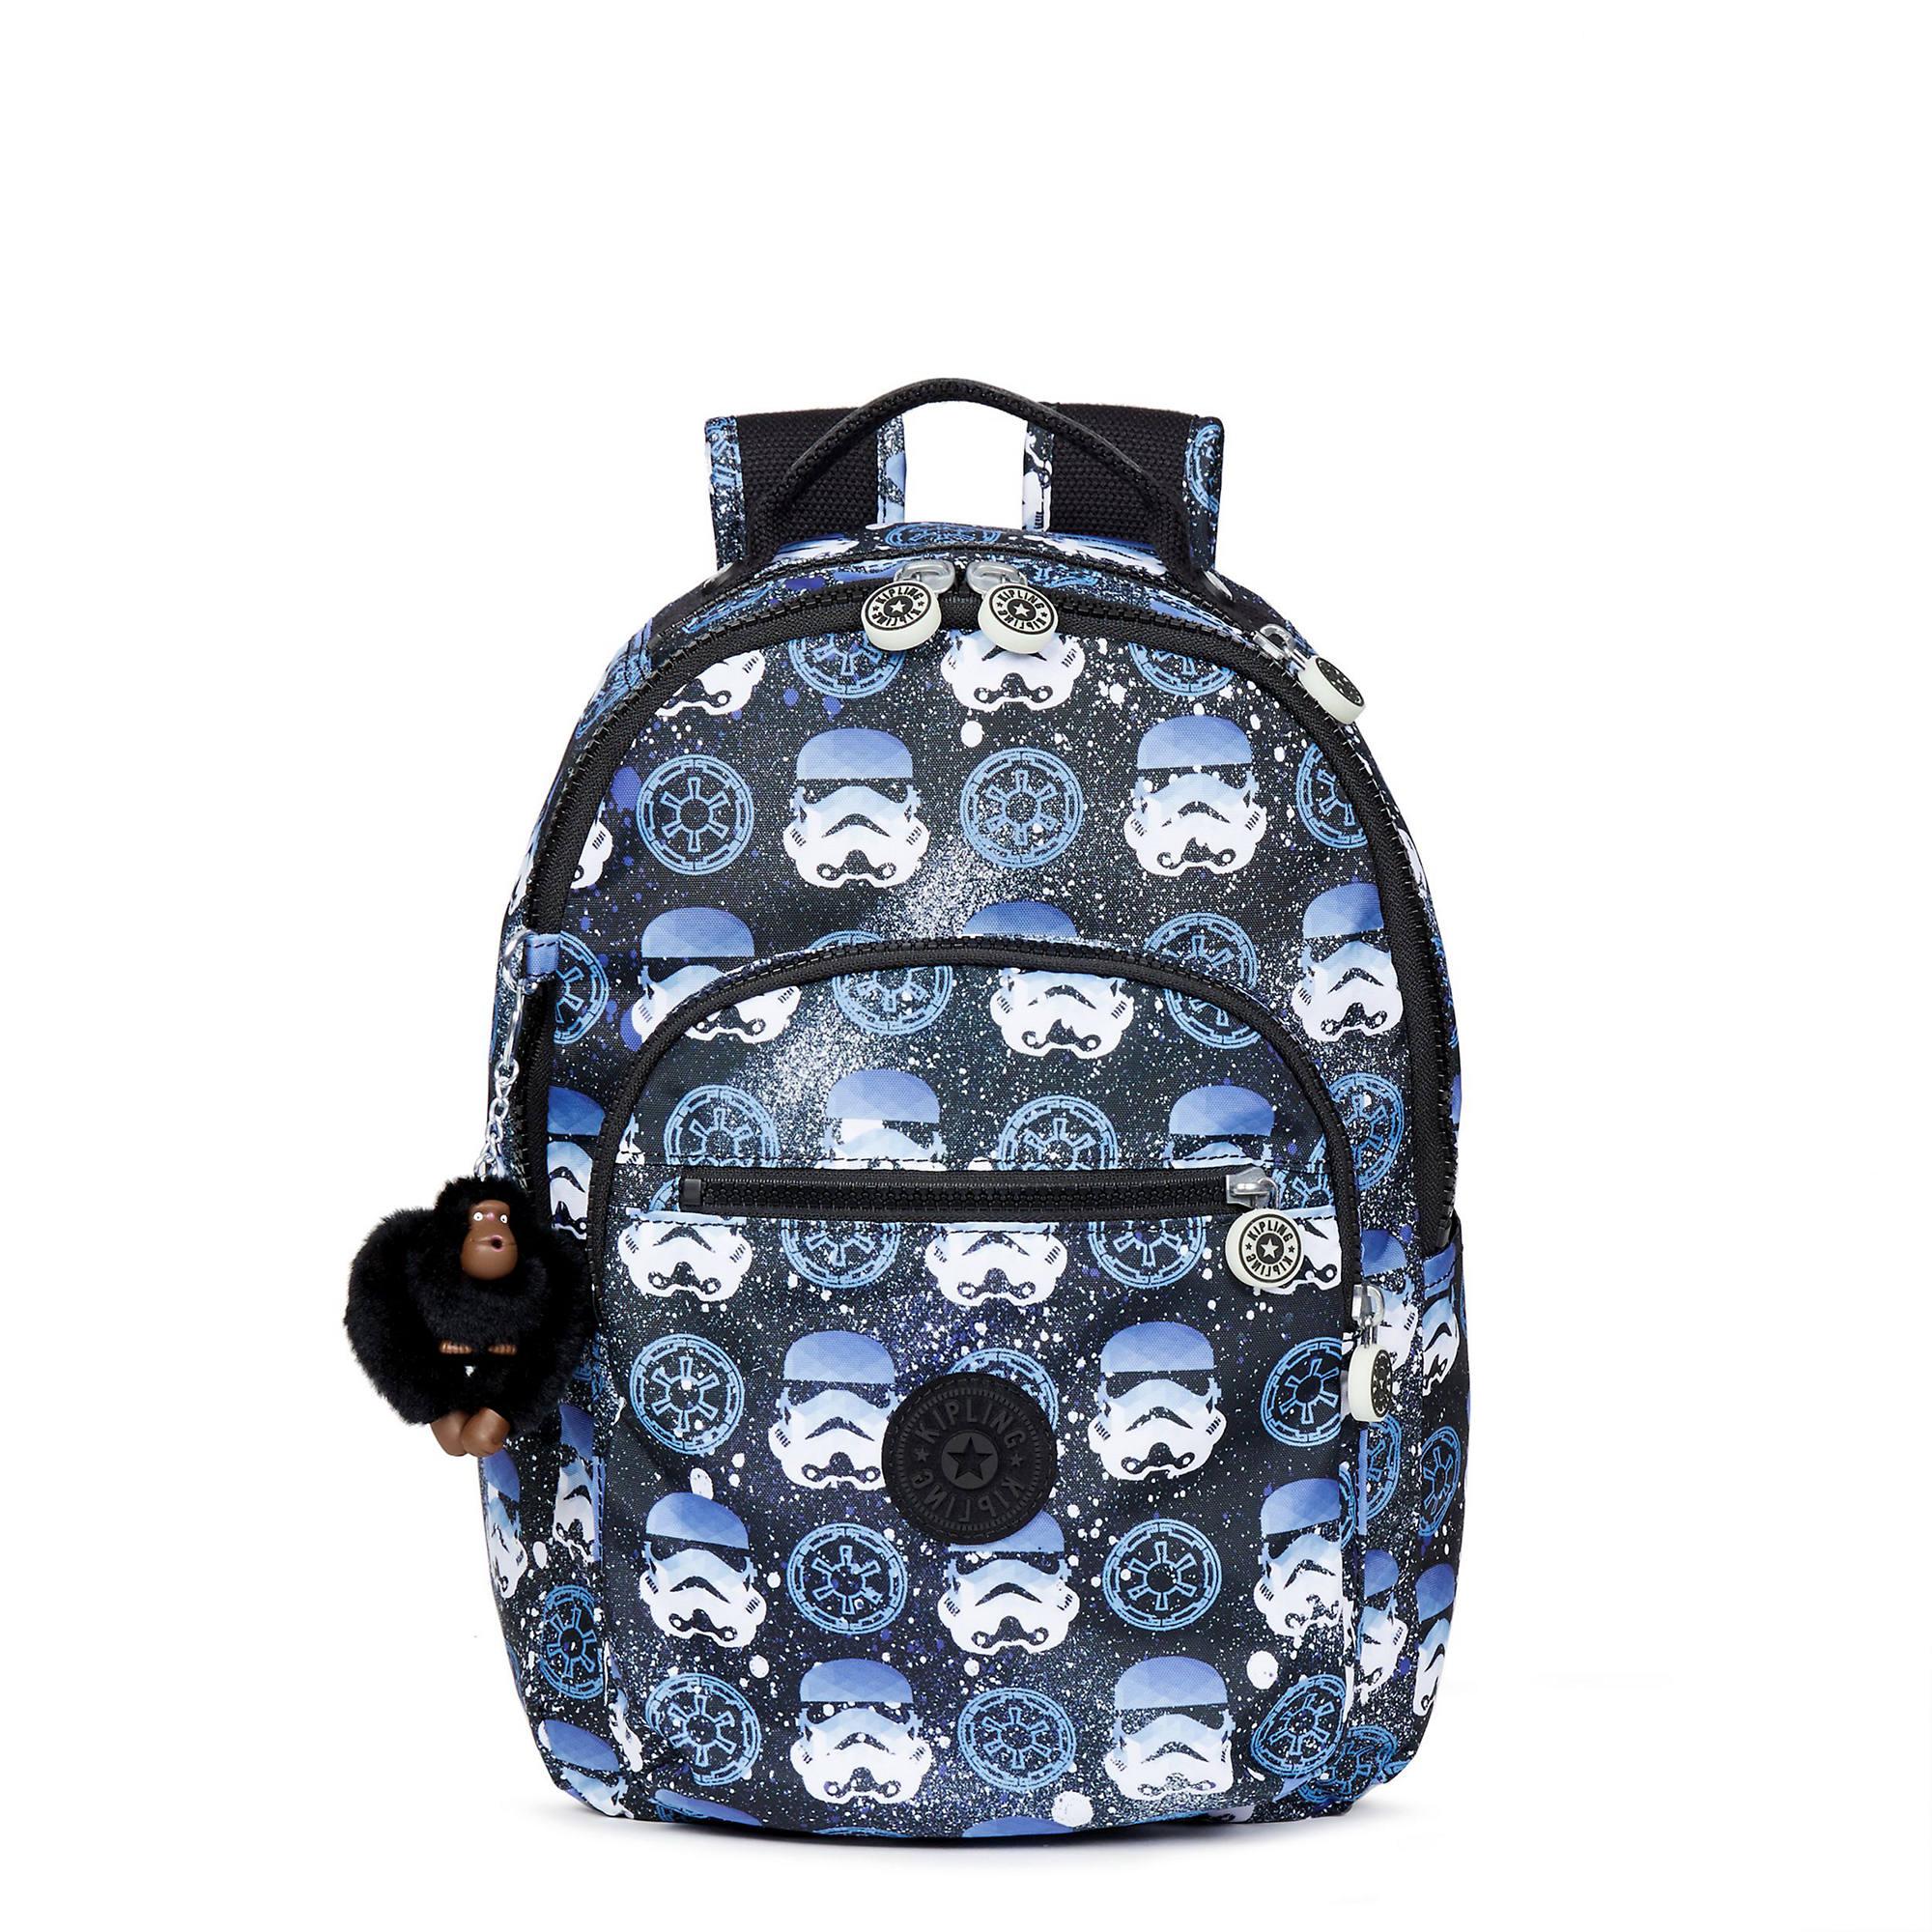 581db51af Star Wars Seoul Go Small Printed Backpack,Surreal Dot,large